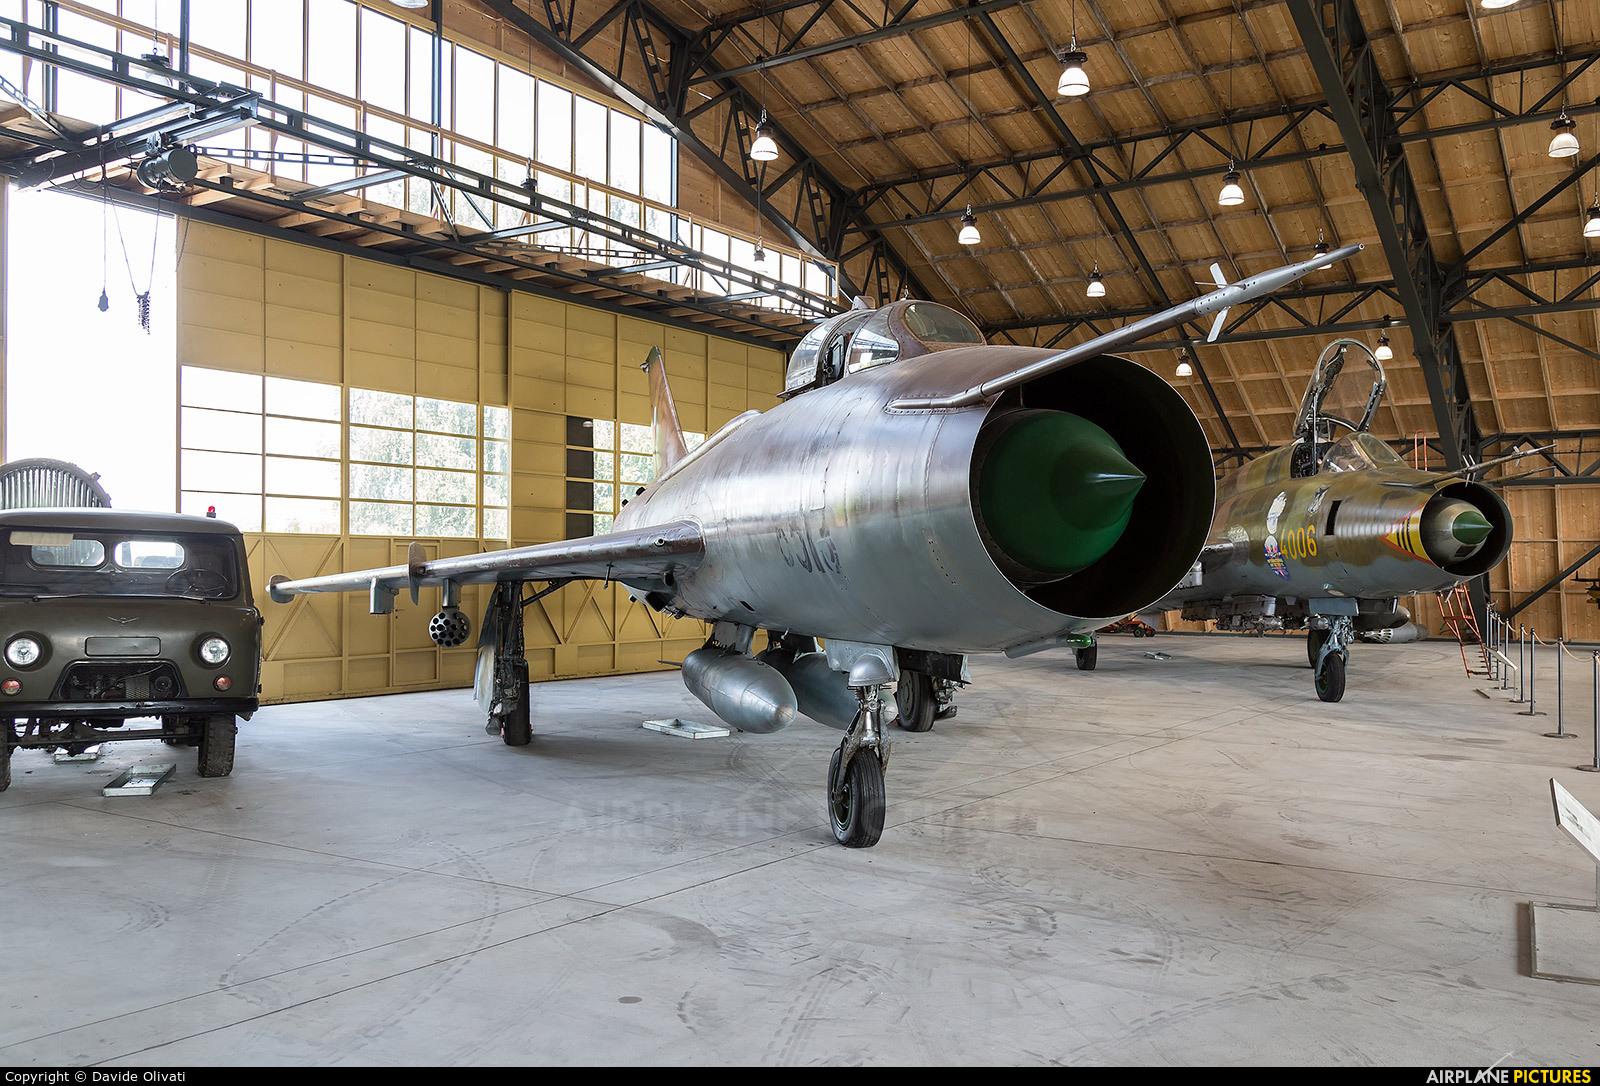 Czechoslovak - Air Force 6513 aircraft at Prague - Kbely, Letecké muzeum